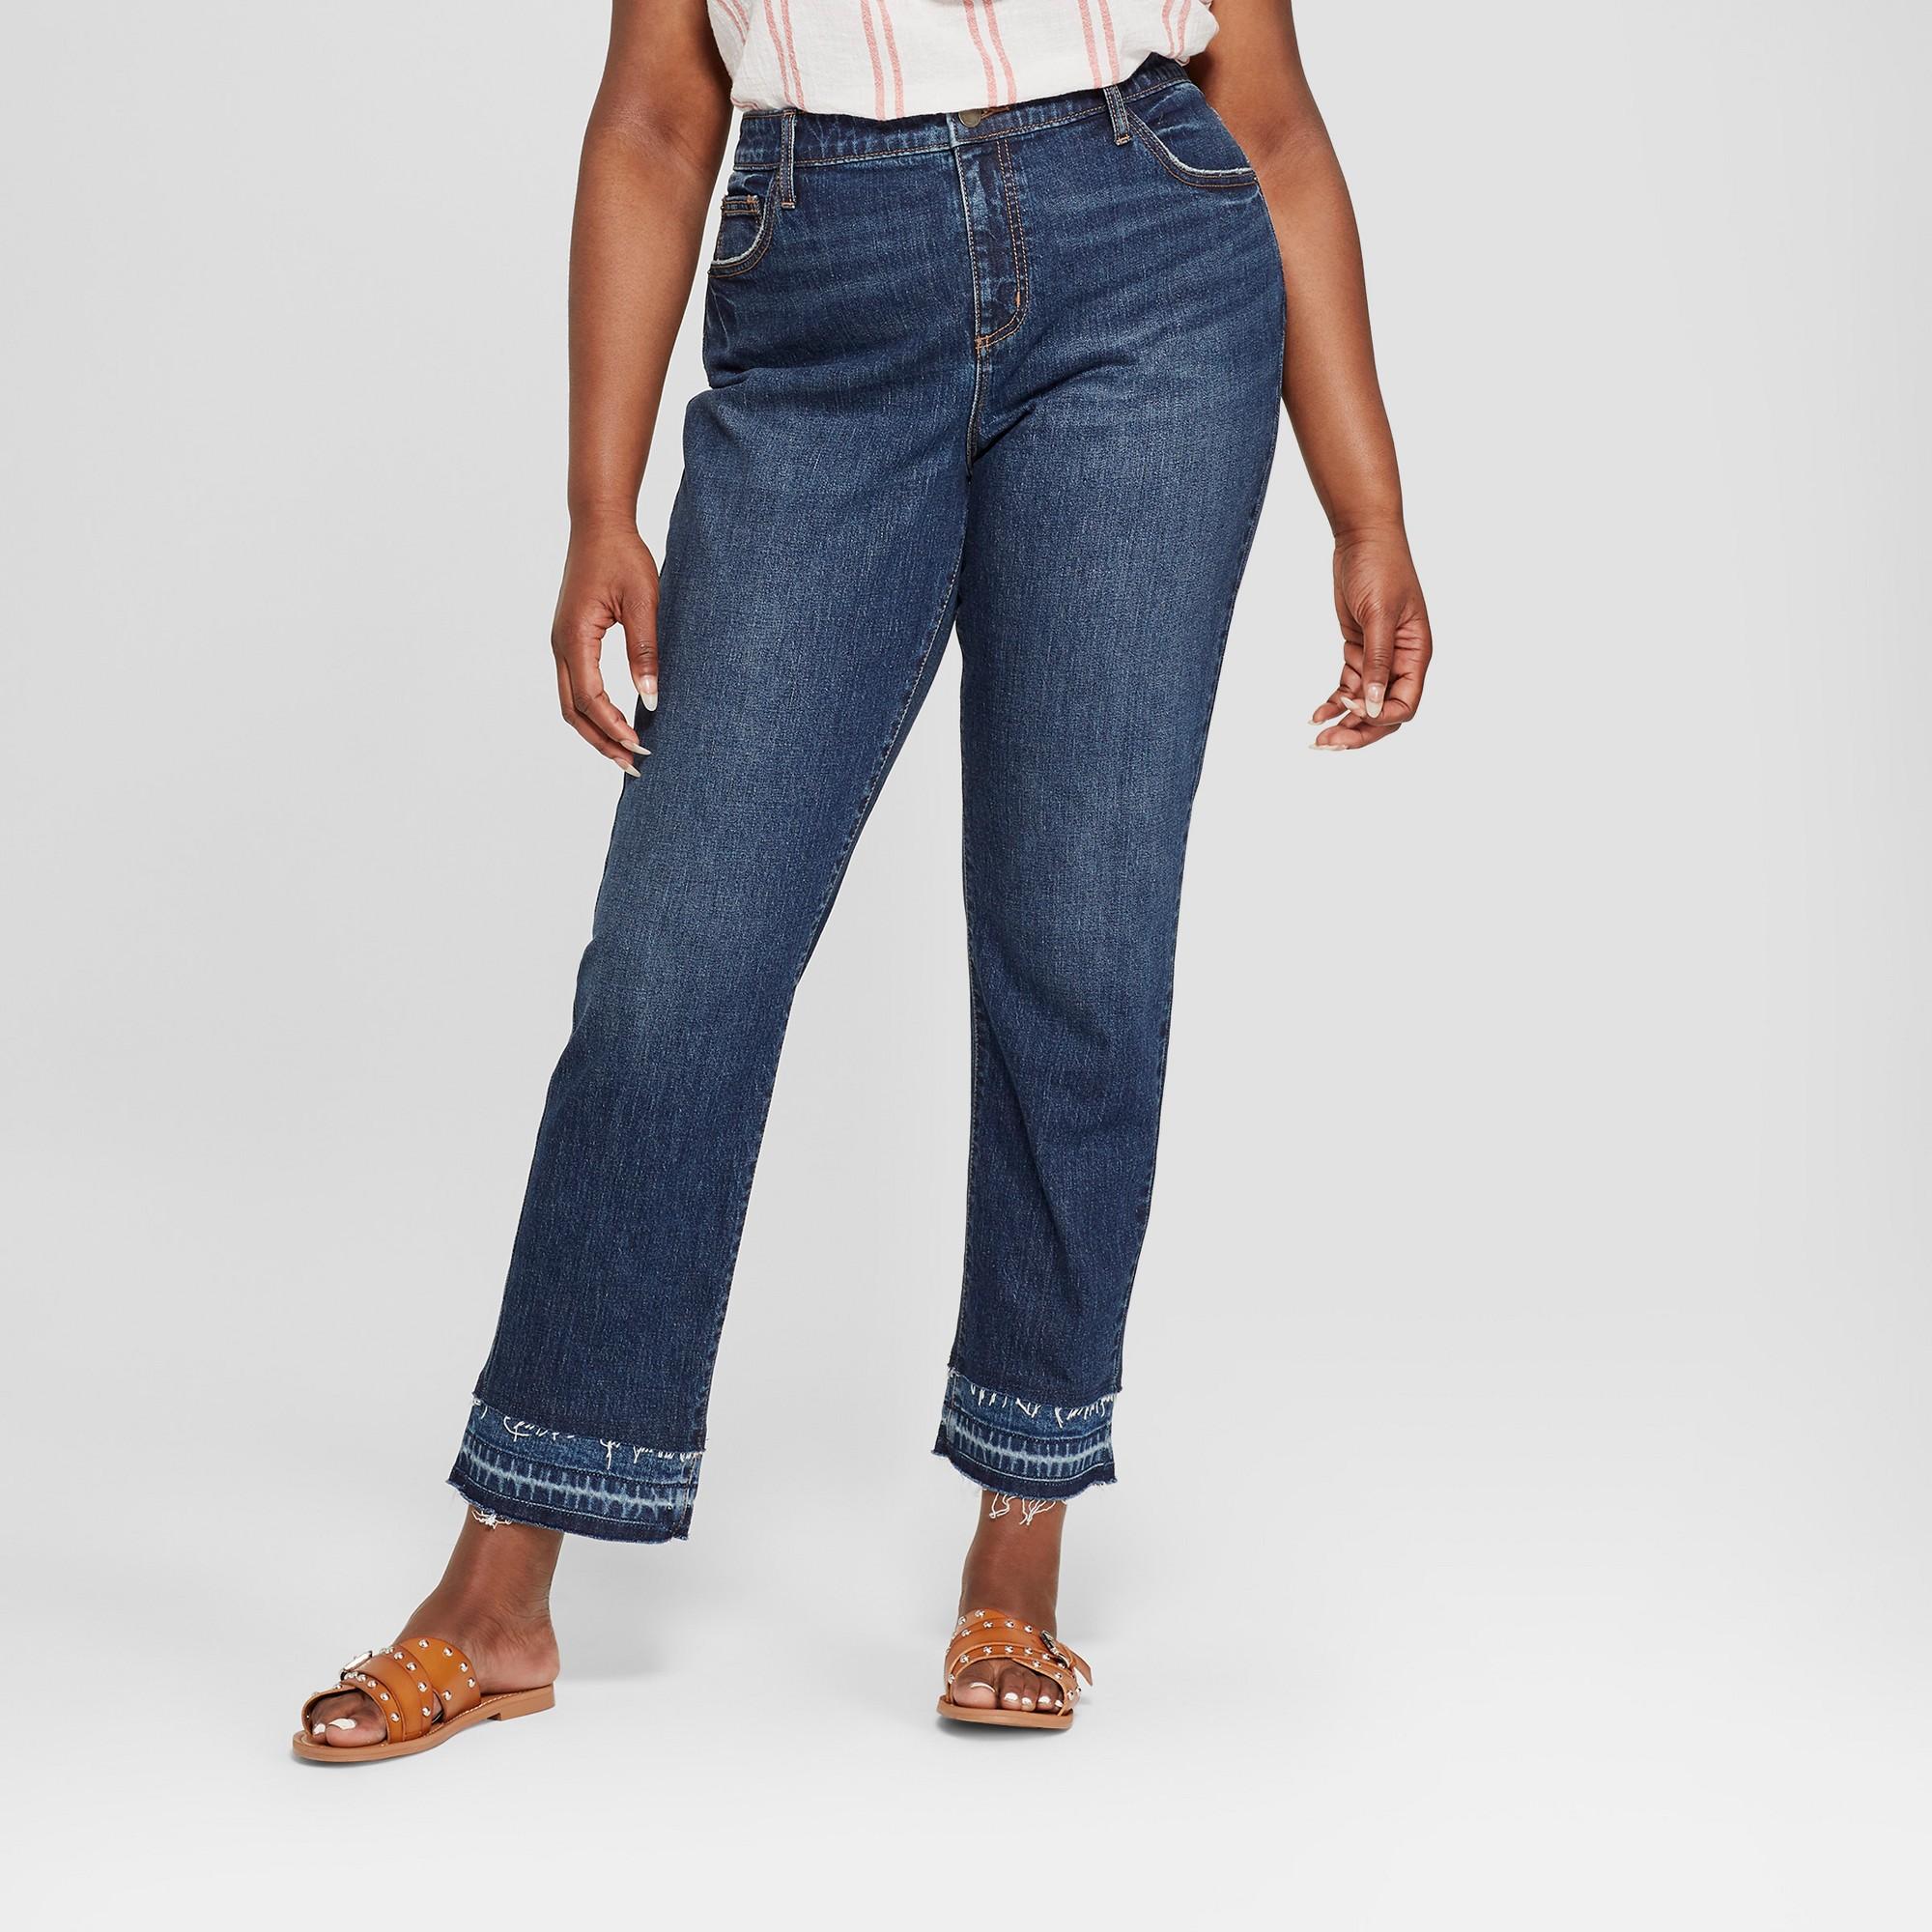 0efc71cd41d Women s Plus Size Released Hem Boyfriend Jeans - Universal Thread Dark Wash  14W